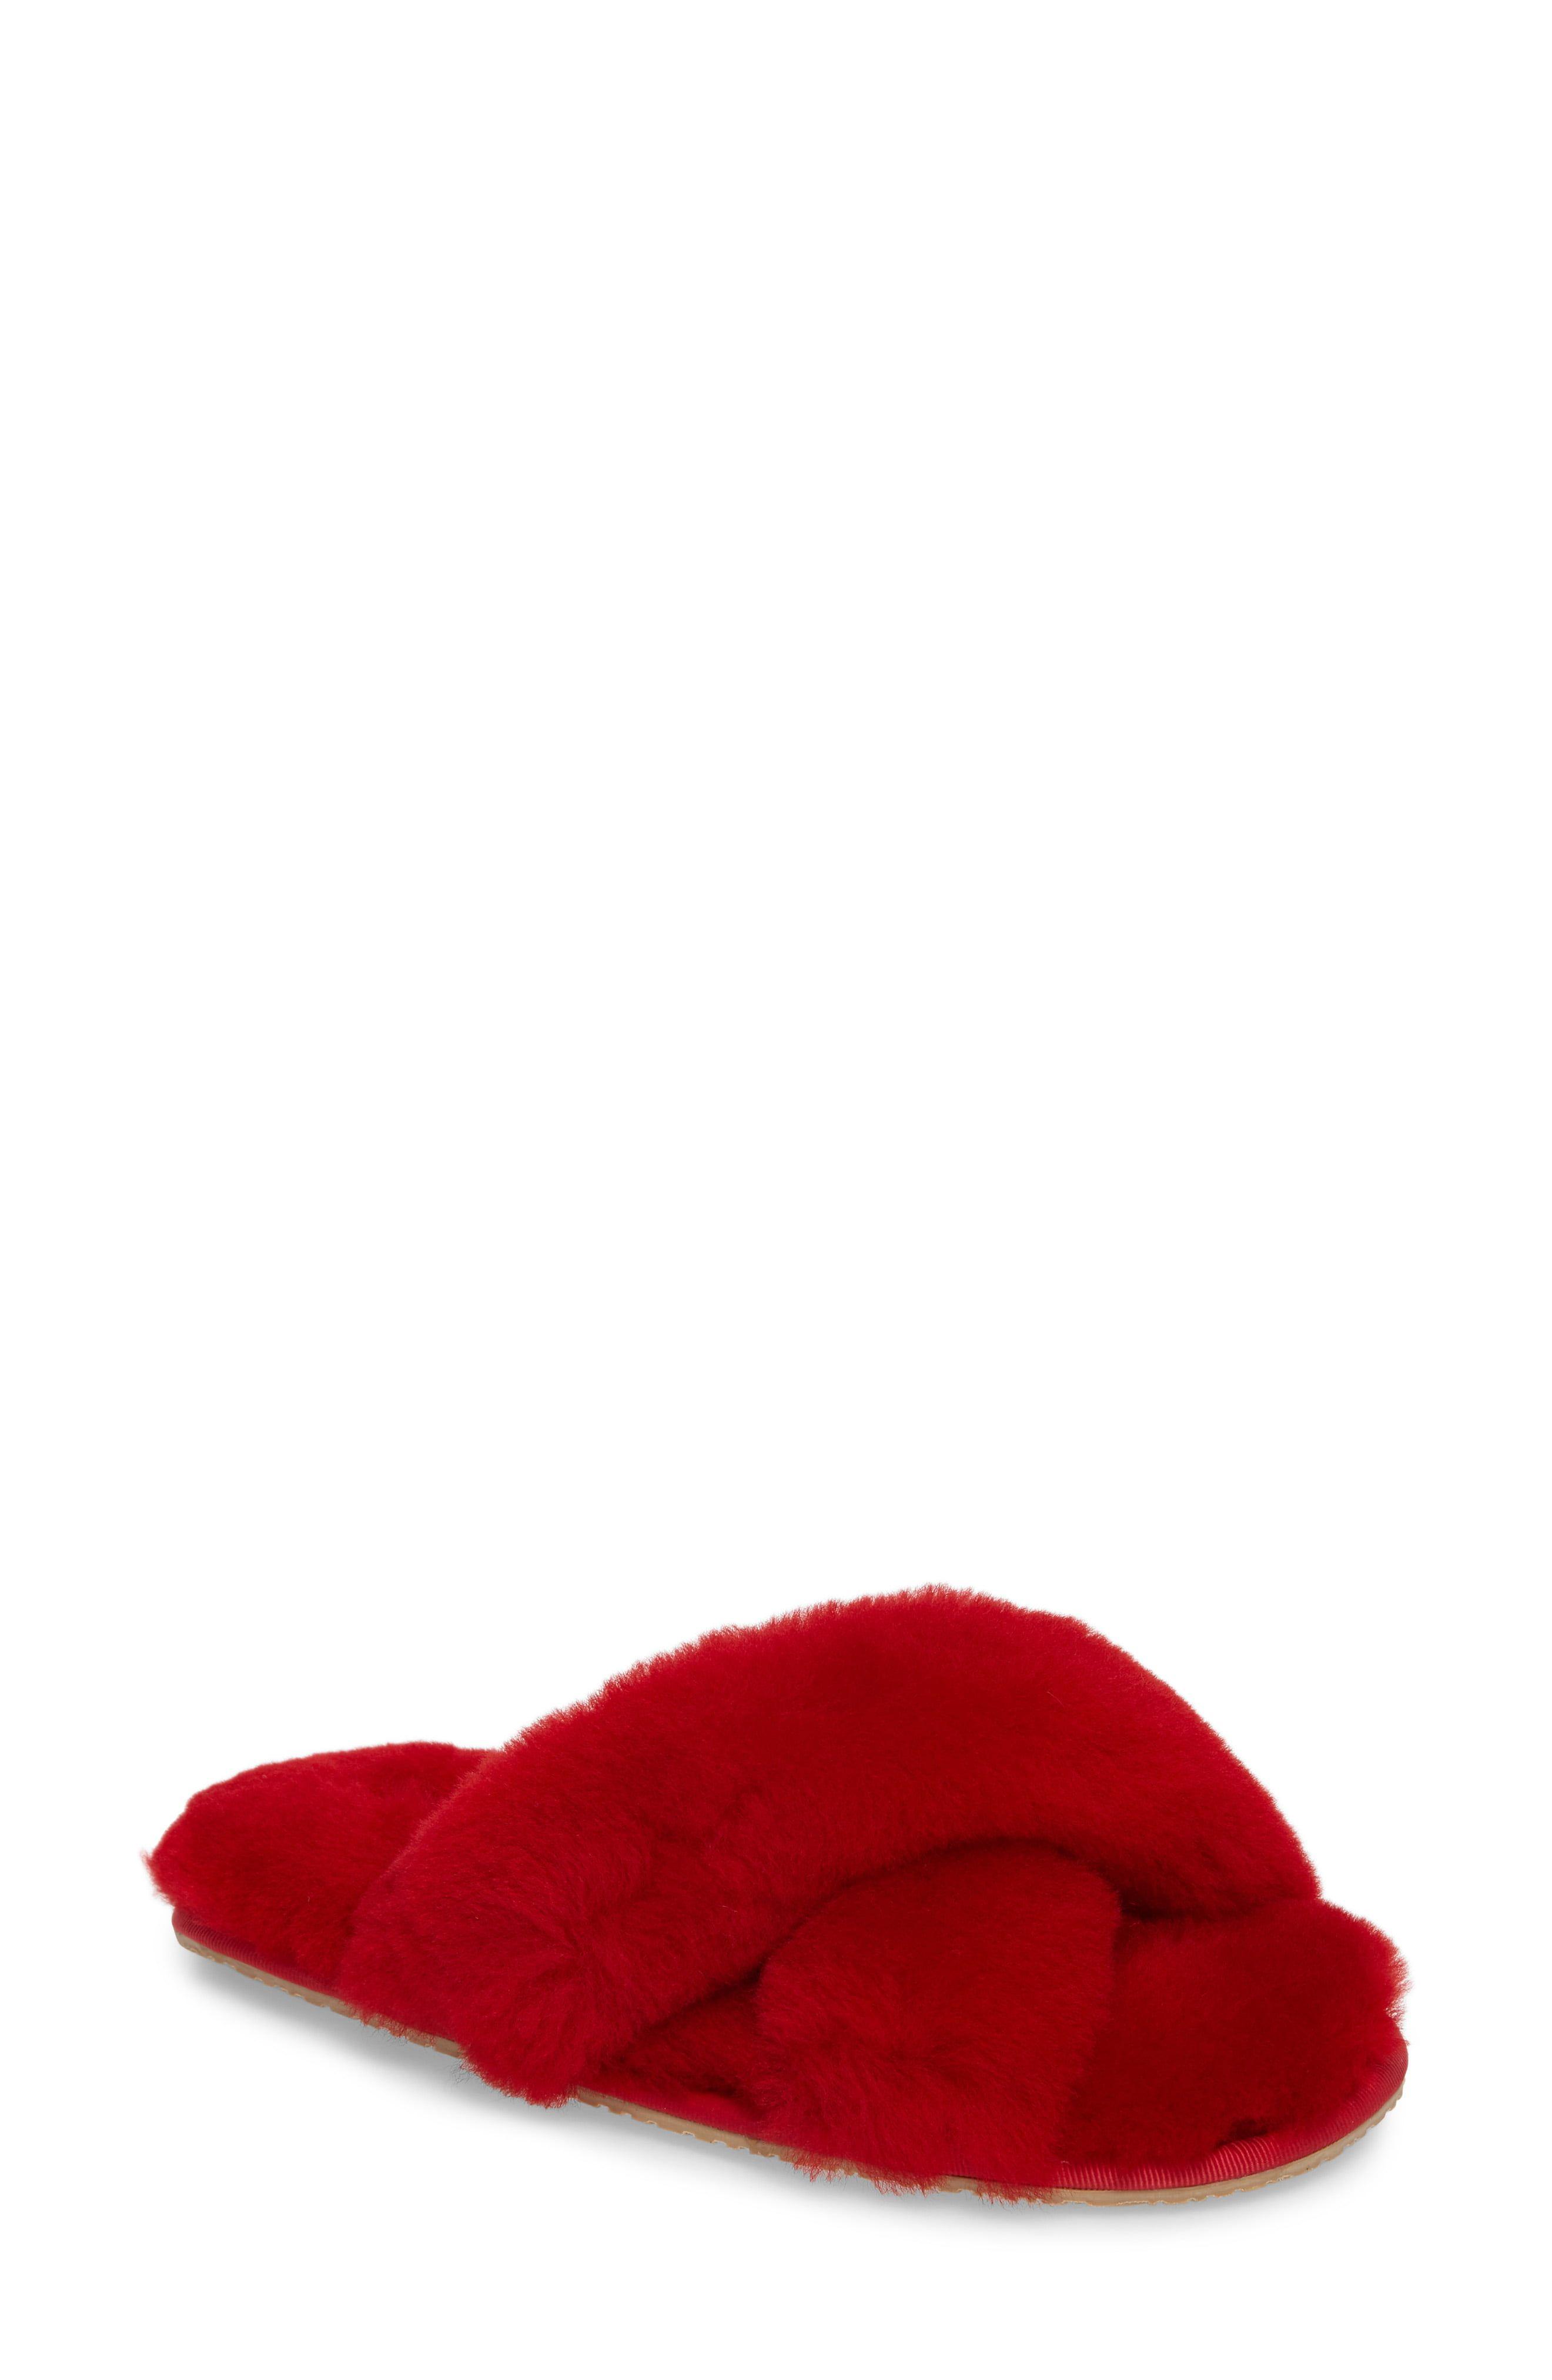 795420a3cbb Women's Patricia Green Mt. Hood Genuine Shearling Slipper, Size 6 M ...